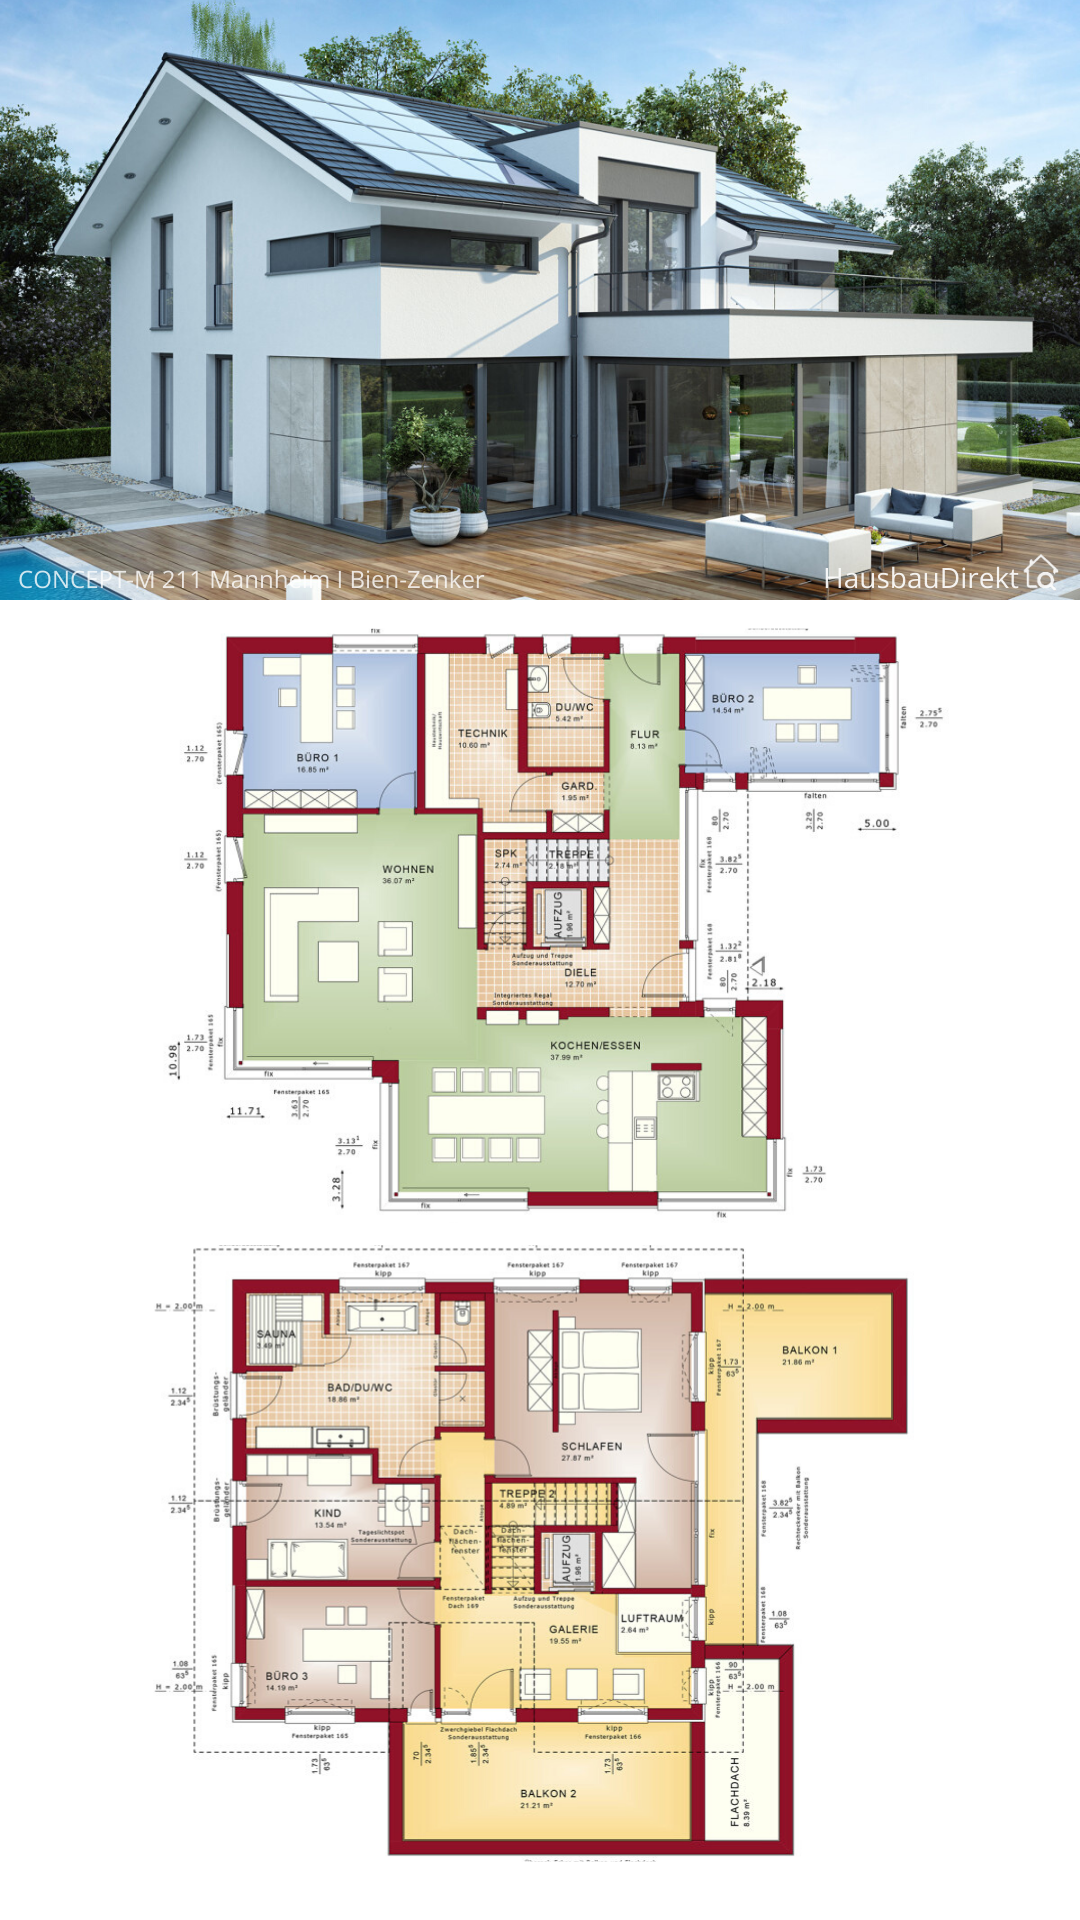 Einfamilienhaus Grundriss modern offen mit Satteldach Erker & Balkon bauen Haus Ideen Fertighaus